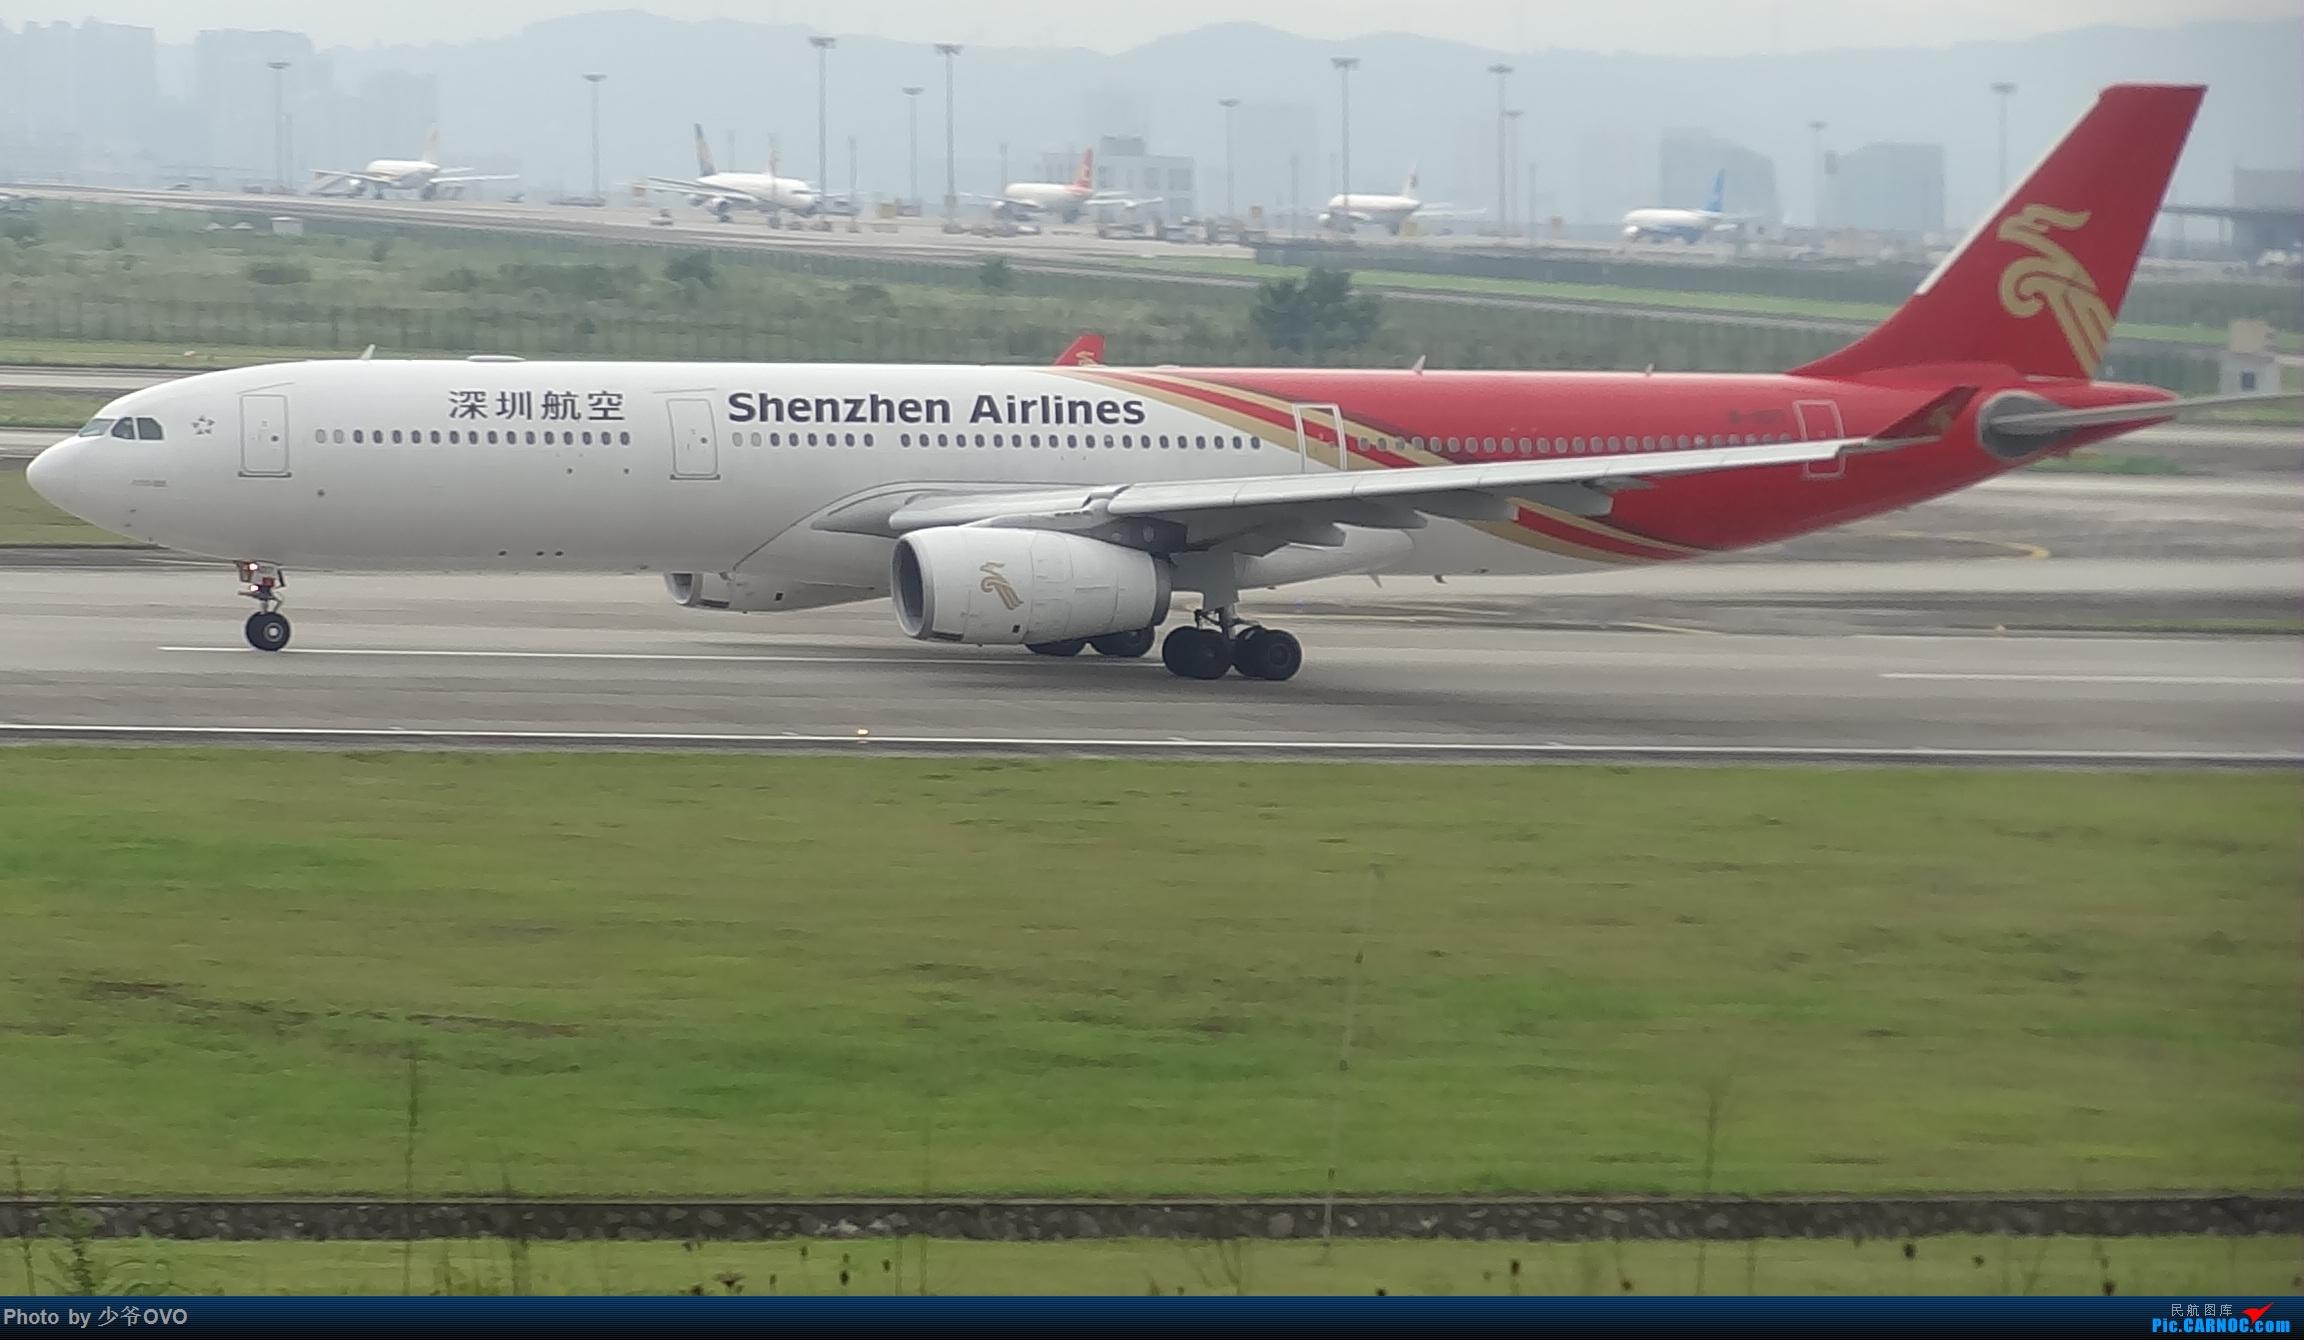 Re:[原创]CKG重庆江北机场拍机 ,中法建交50周年 AIRBUS A330-300 B-1017 中国重庆江北国际机场